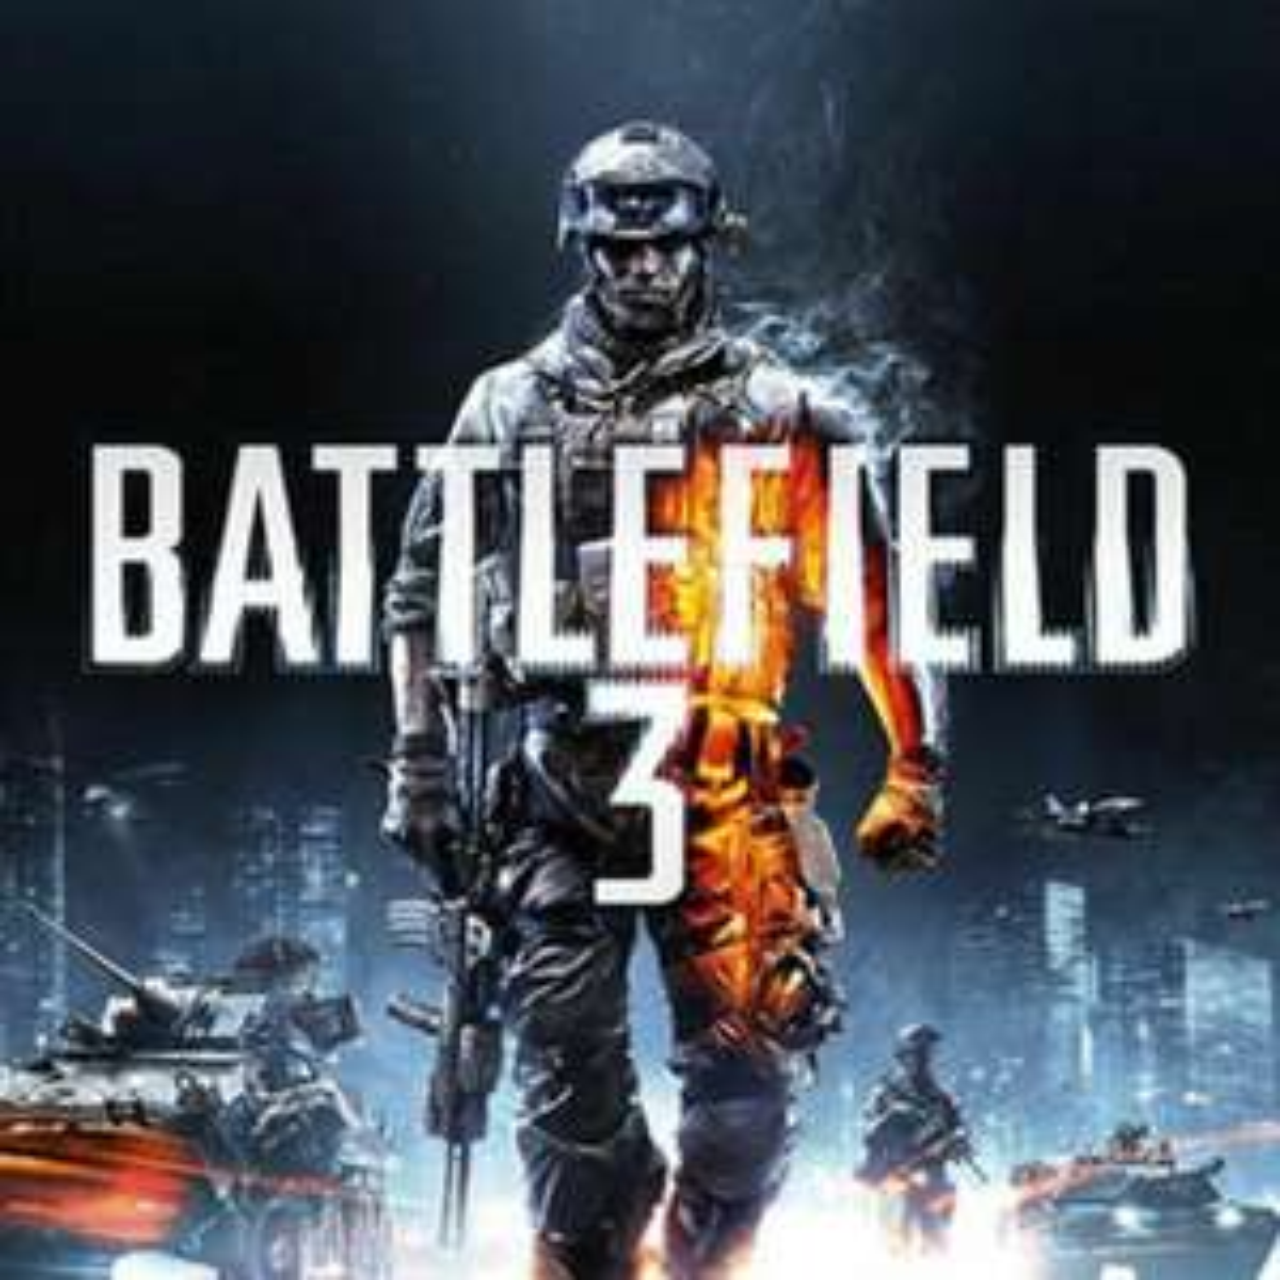 Battlefield 3 (PC) kostenlos (Amazon / Twitch Prime)